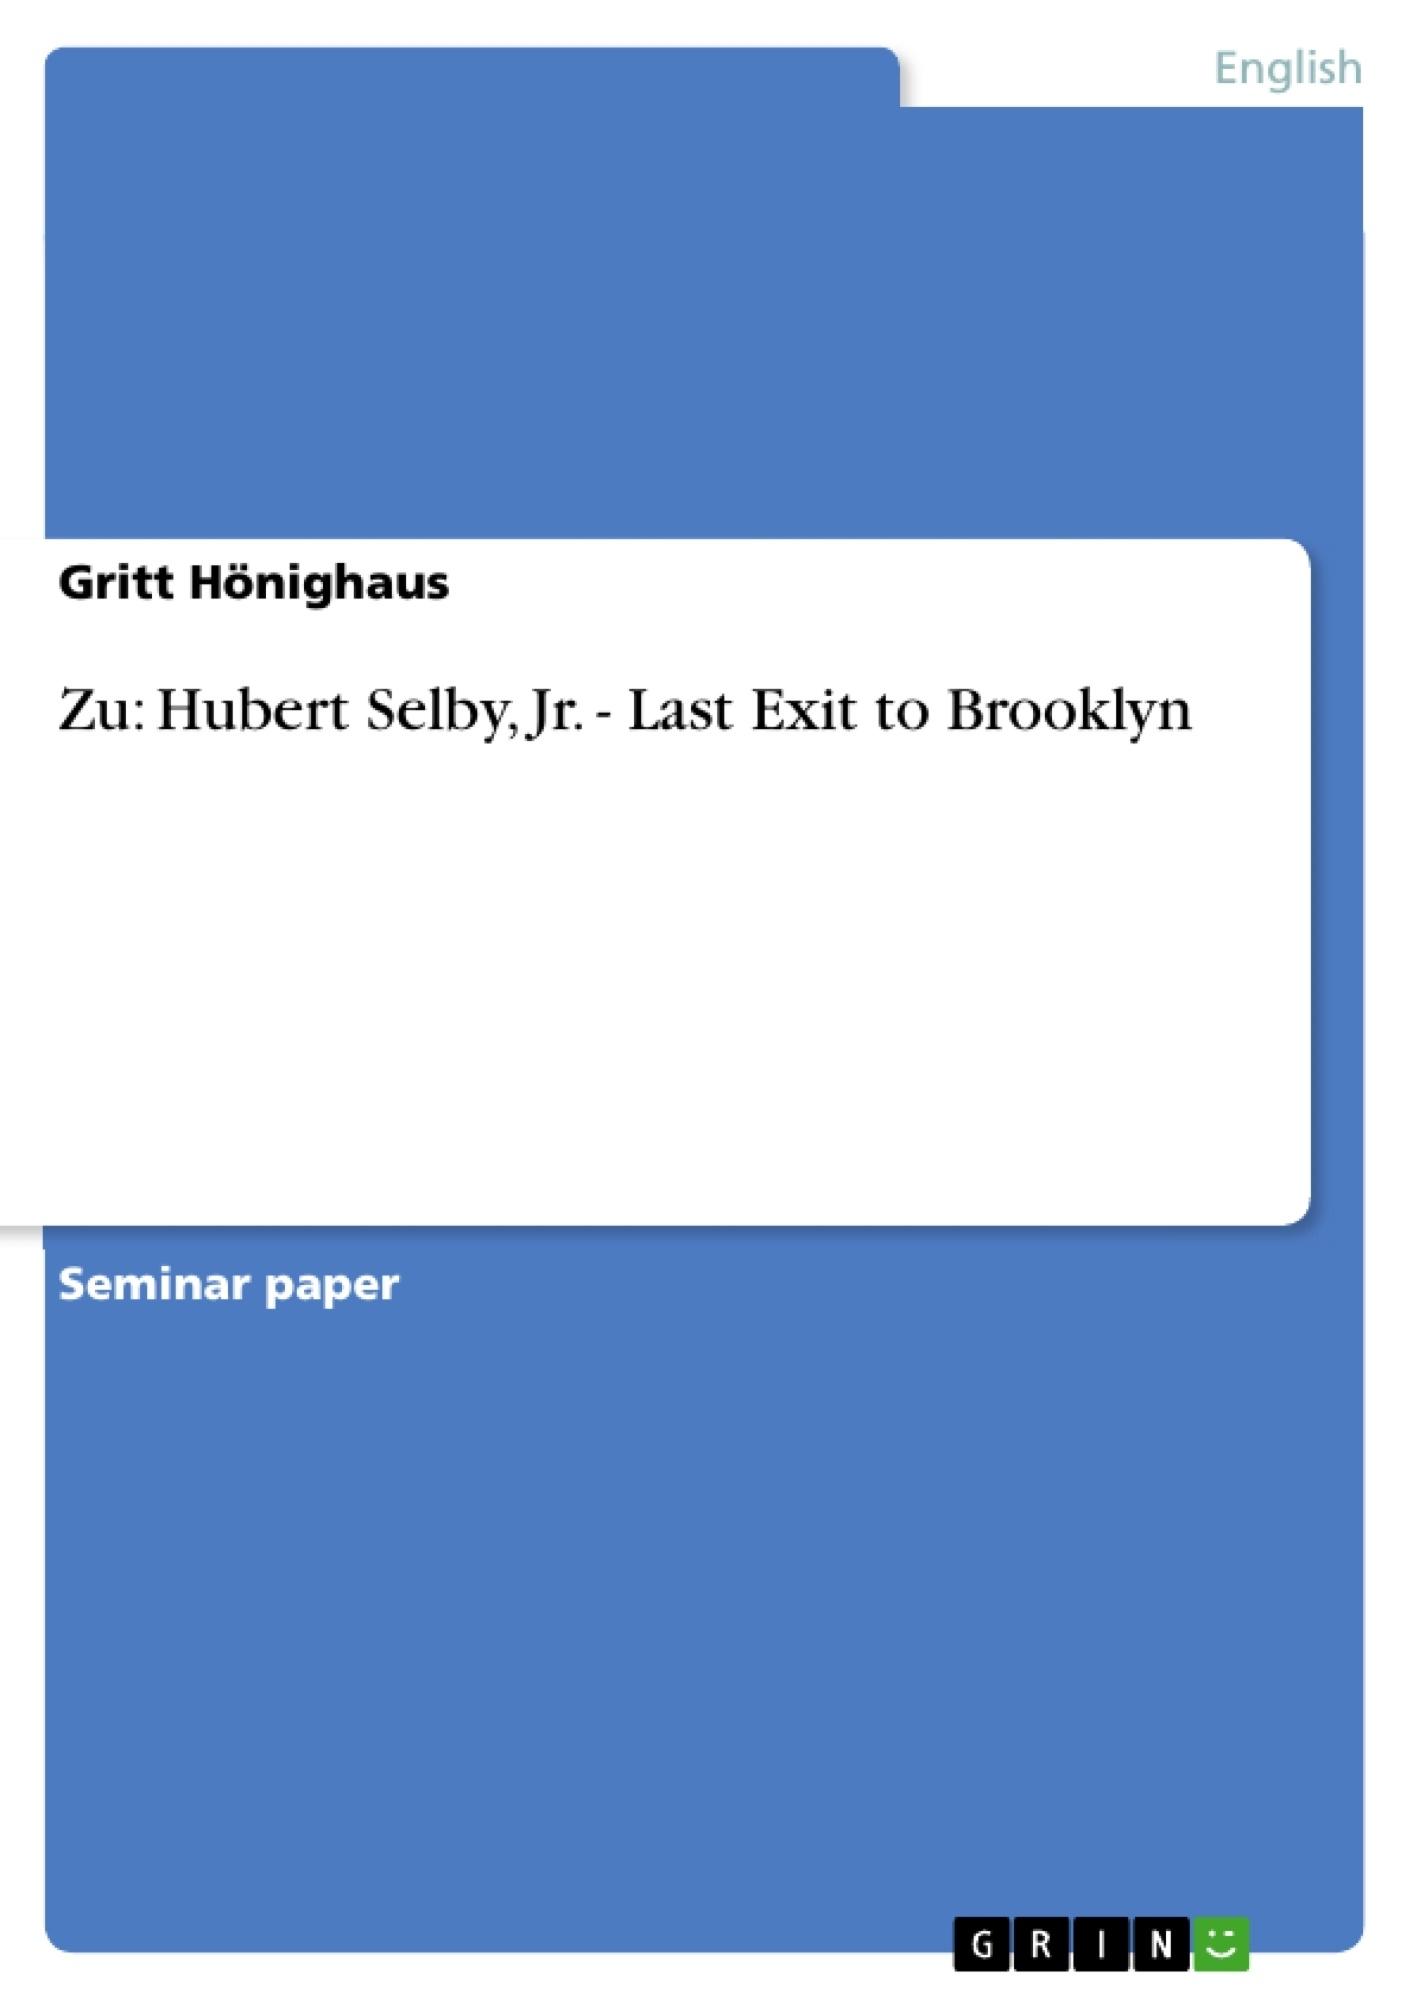 Title: Zu: Hubert Selby, Jr. - Last Exit to Brooklyn